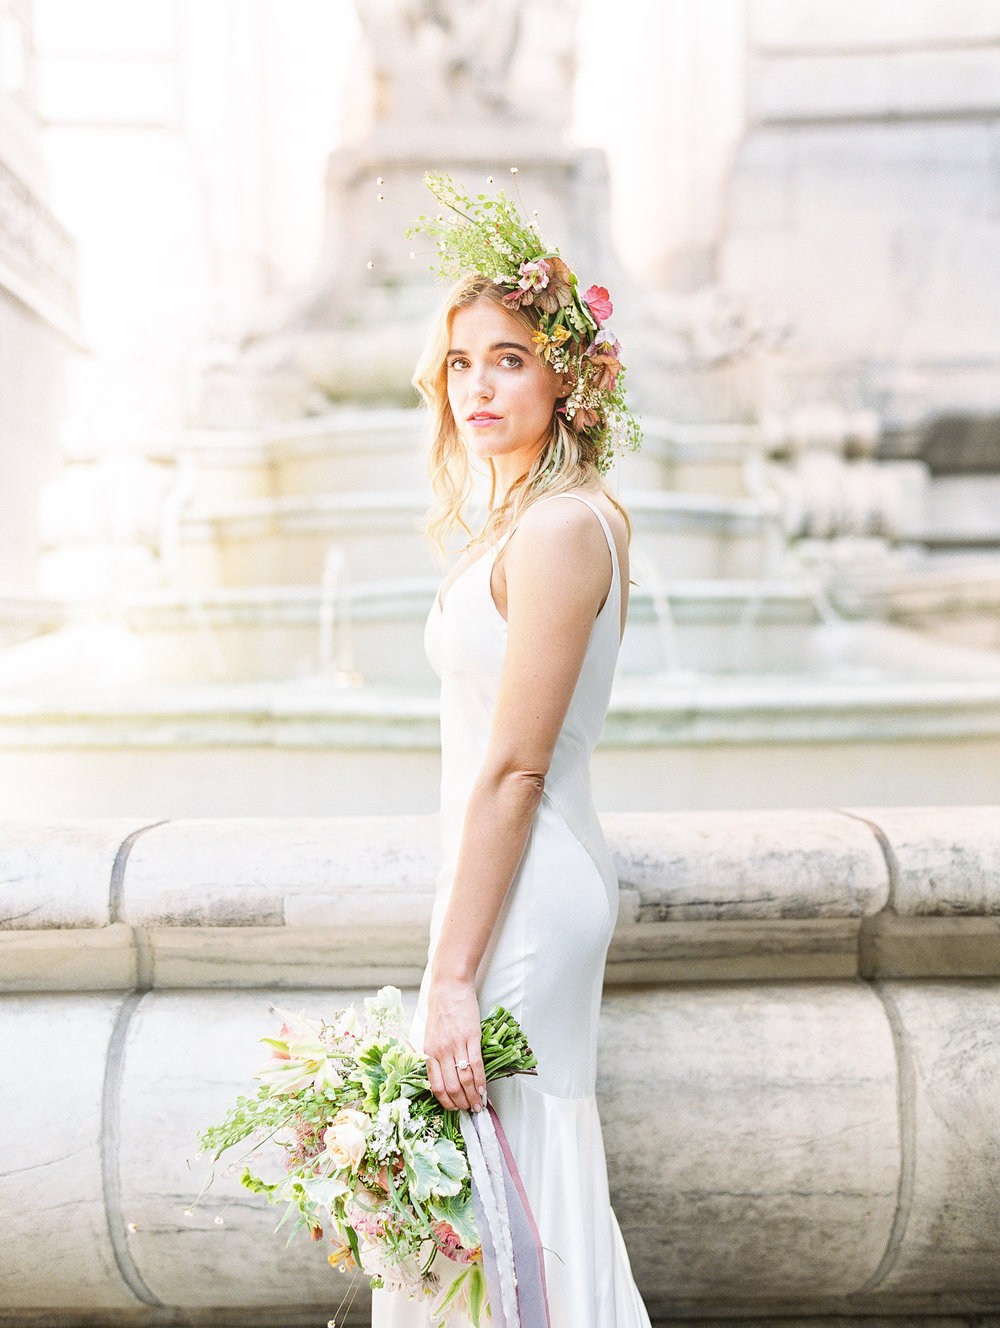 20180508-Pura-Soul-Photo-nyc-bridal--12.jpg